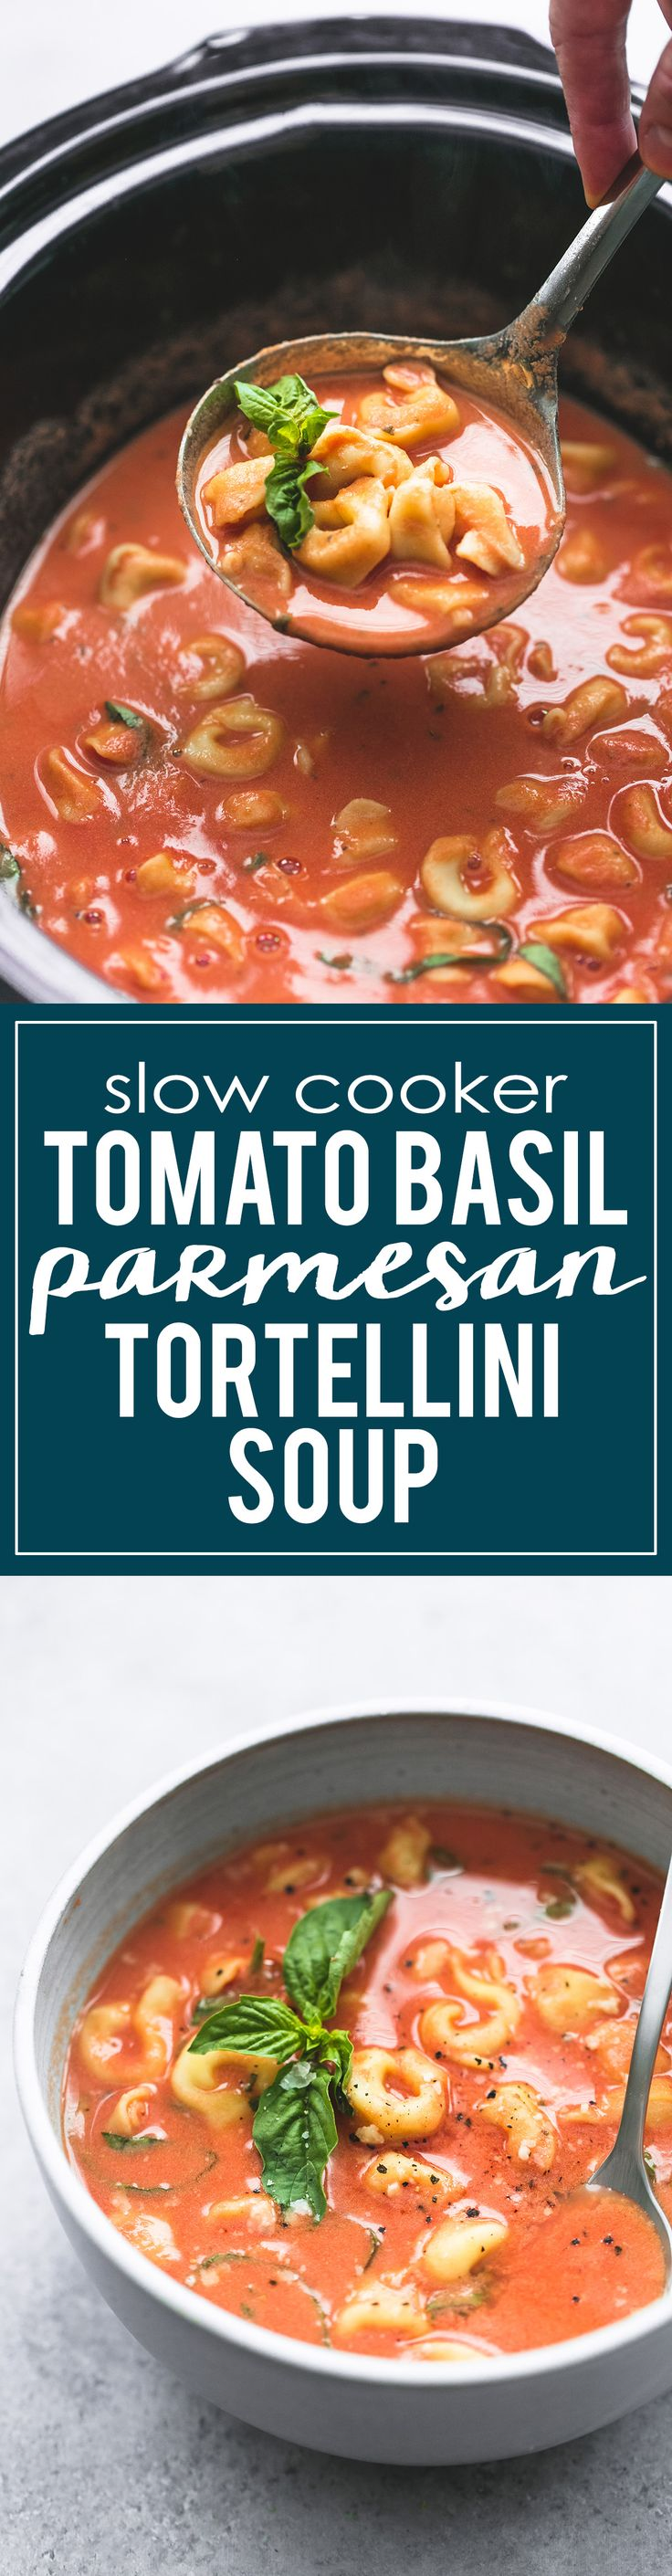 17 best images about pasta soup on pinterest skillets noodle